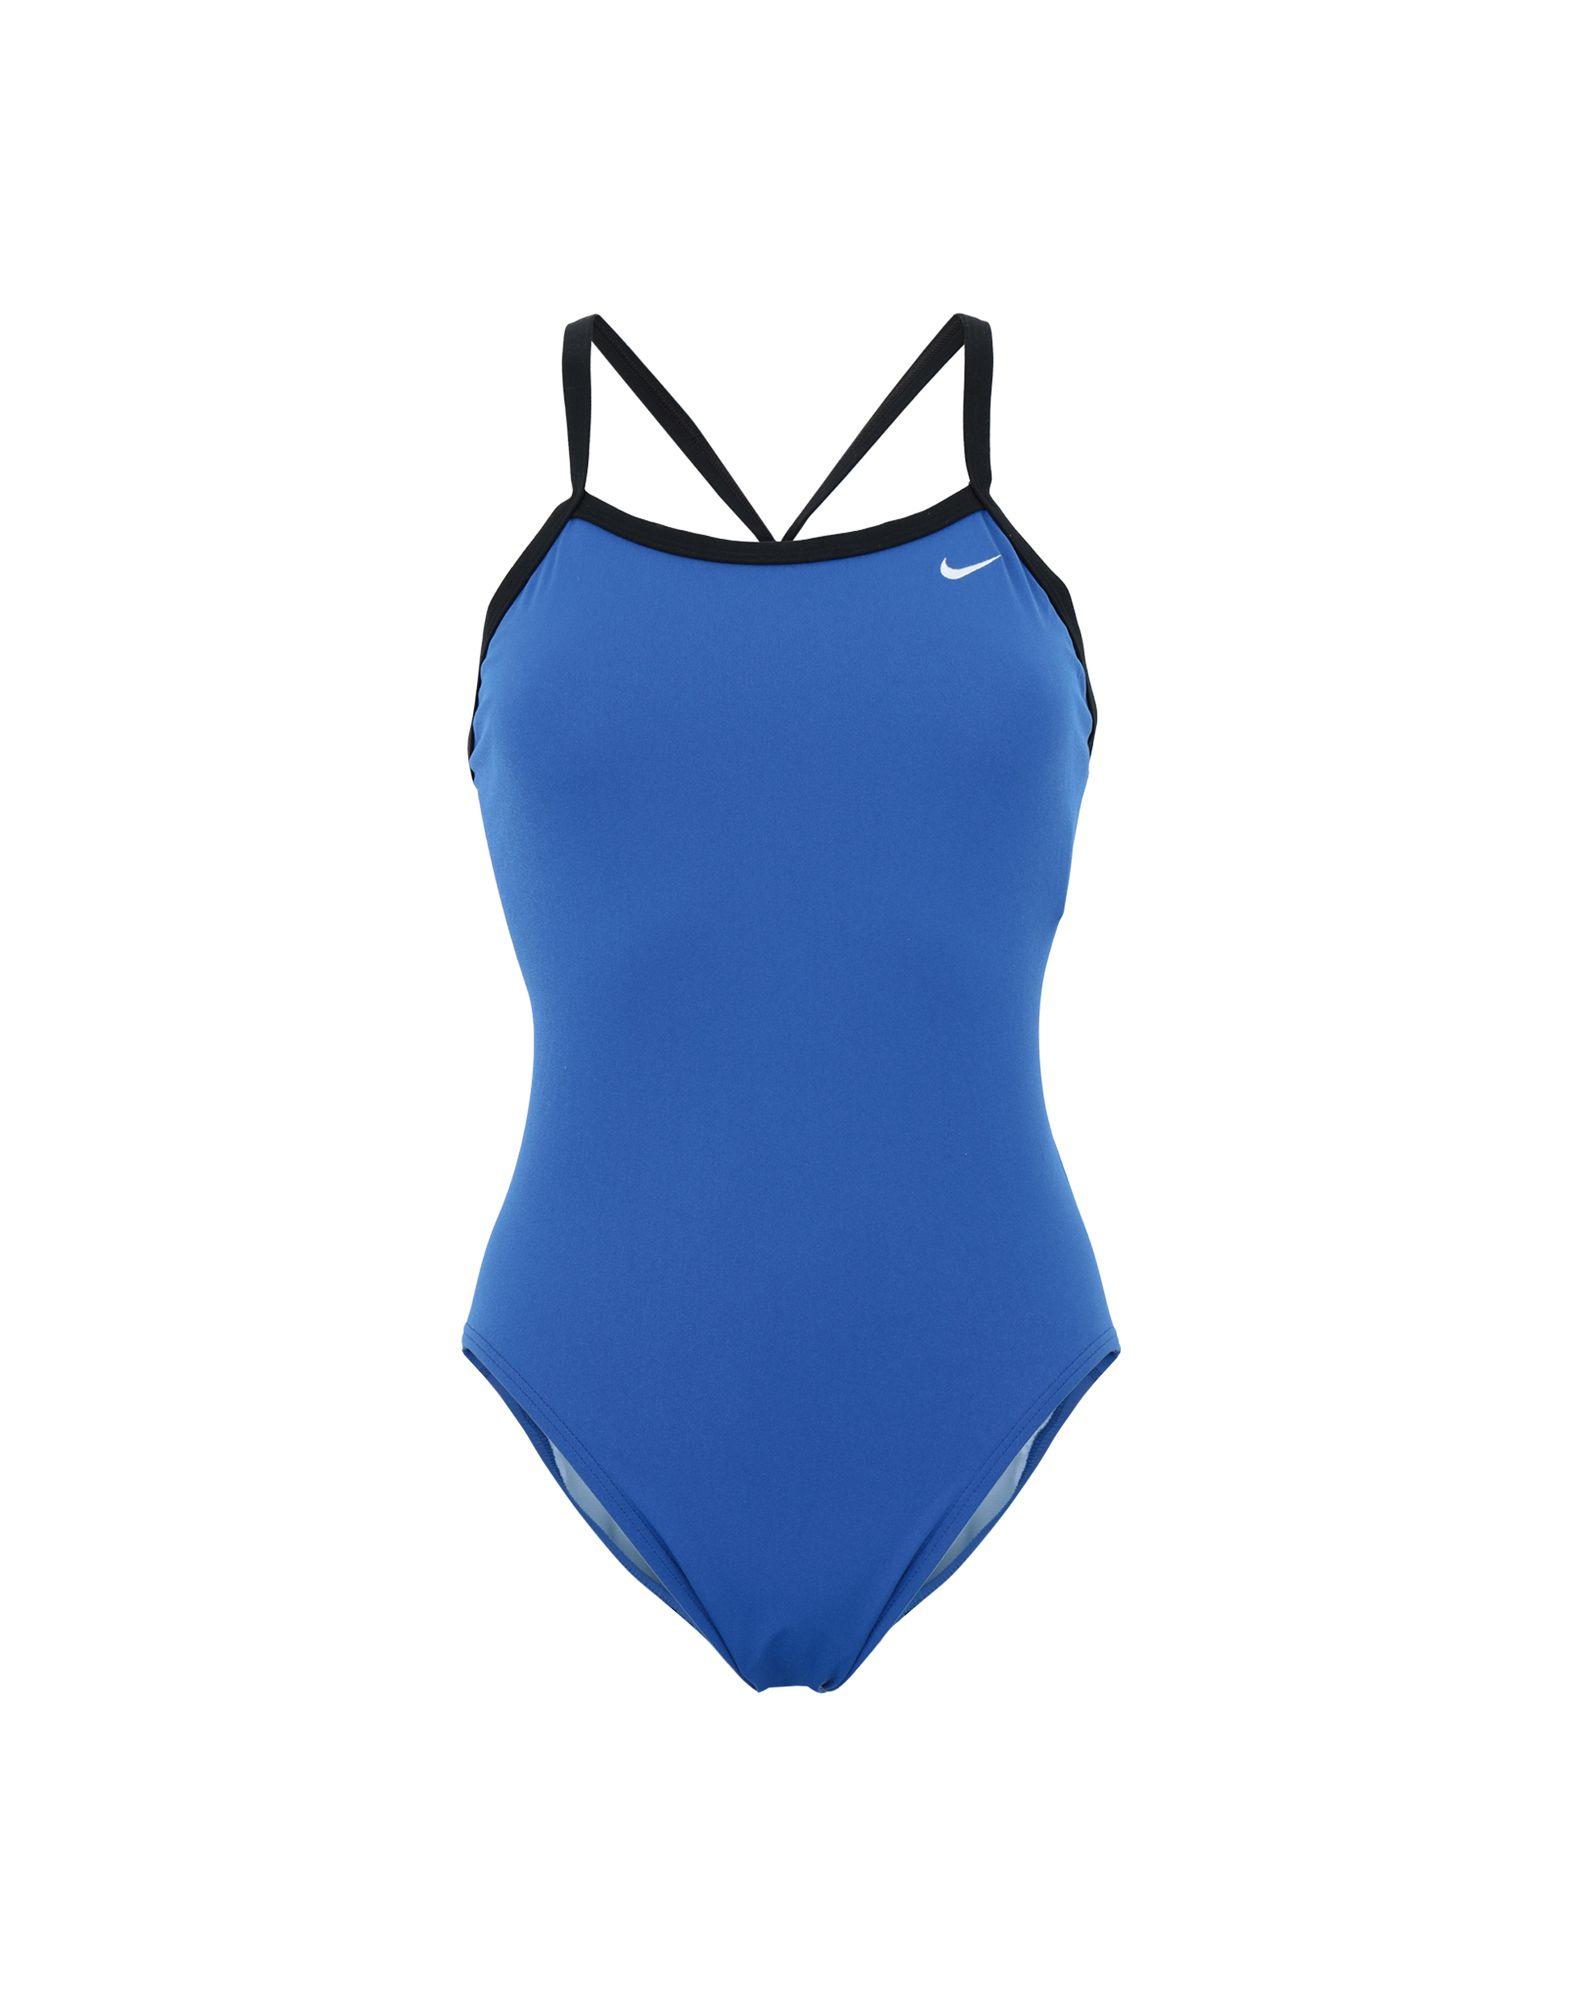 Costume Sportivo Nike Polys Solids Racerback One Piece - damen - 47231931BT